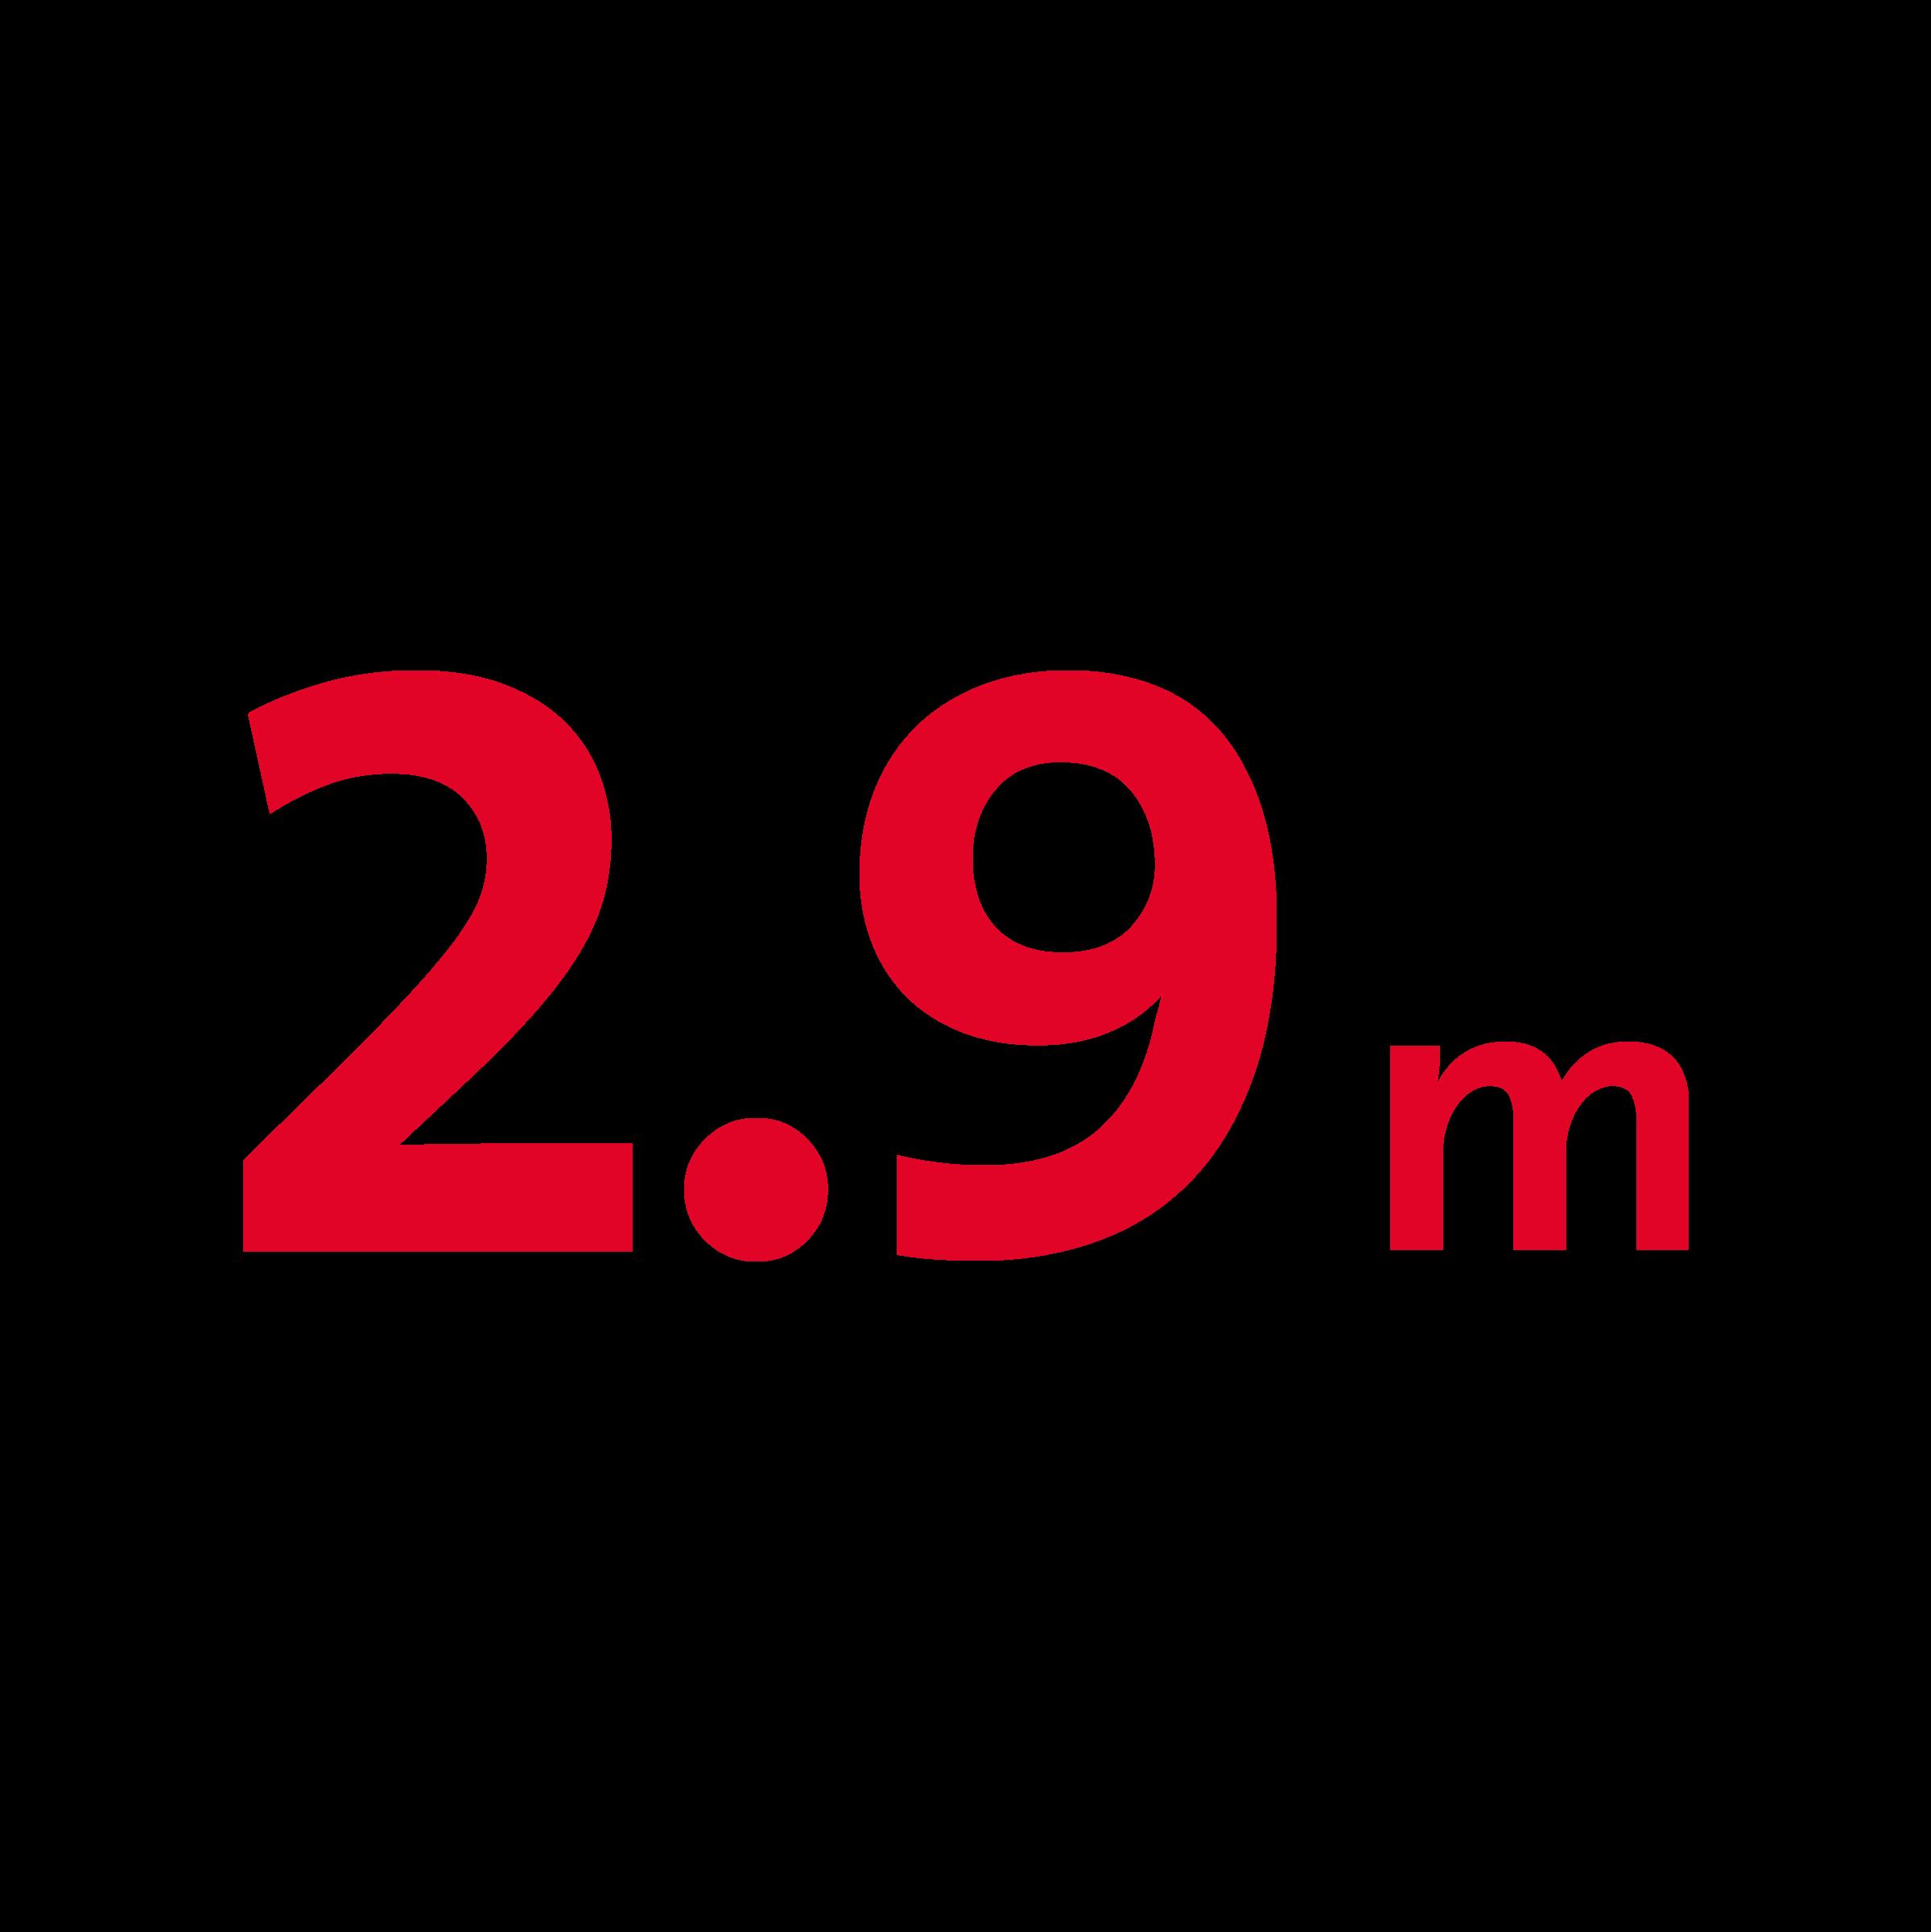 Swisscom at a glance